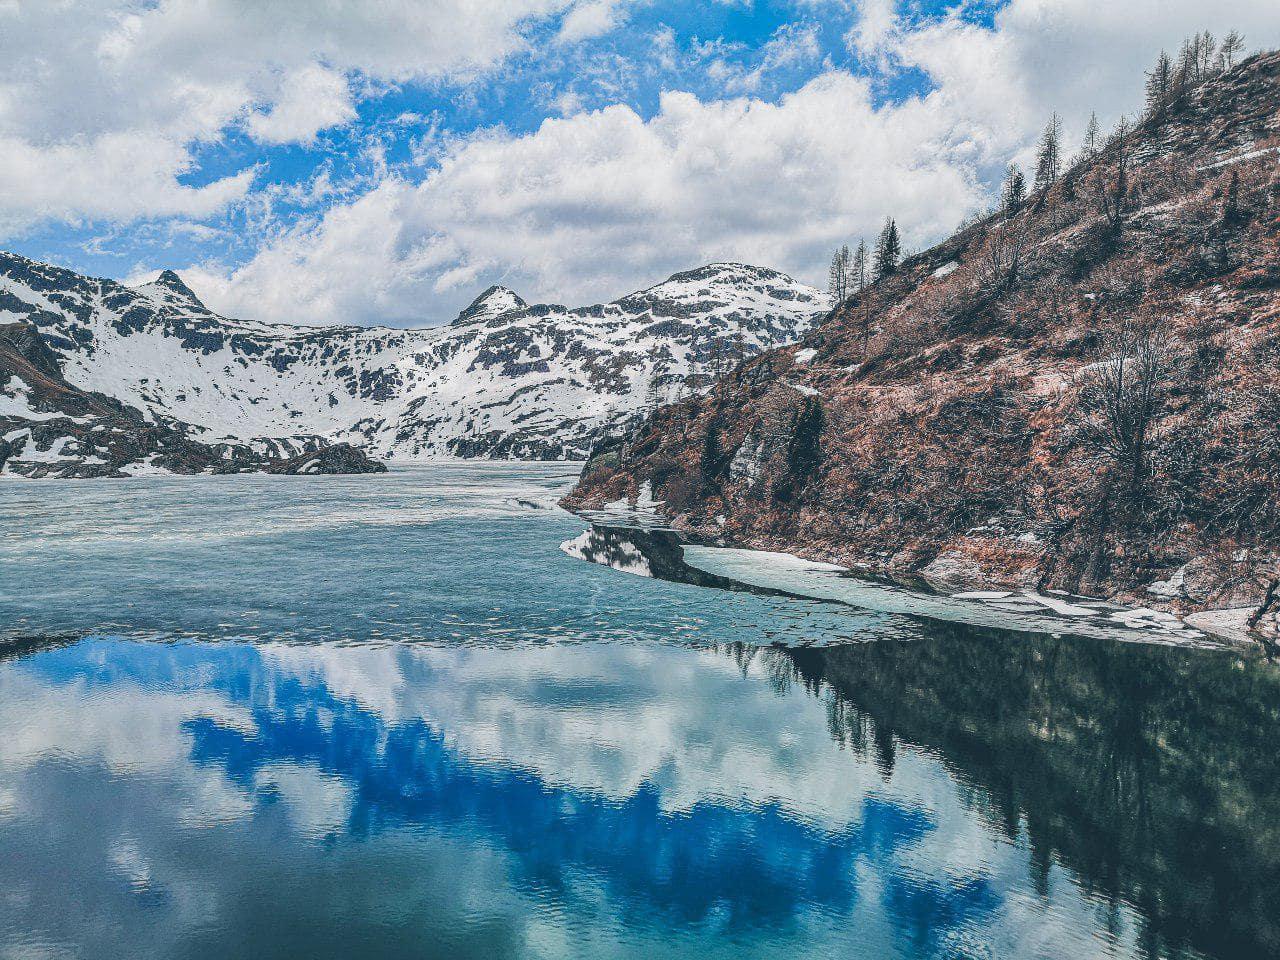 i laghi gemelli ancora ghiacciati avvolti dalle montagne innevate